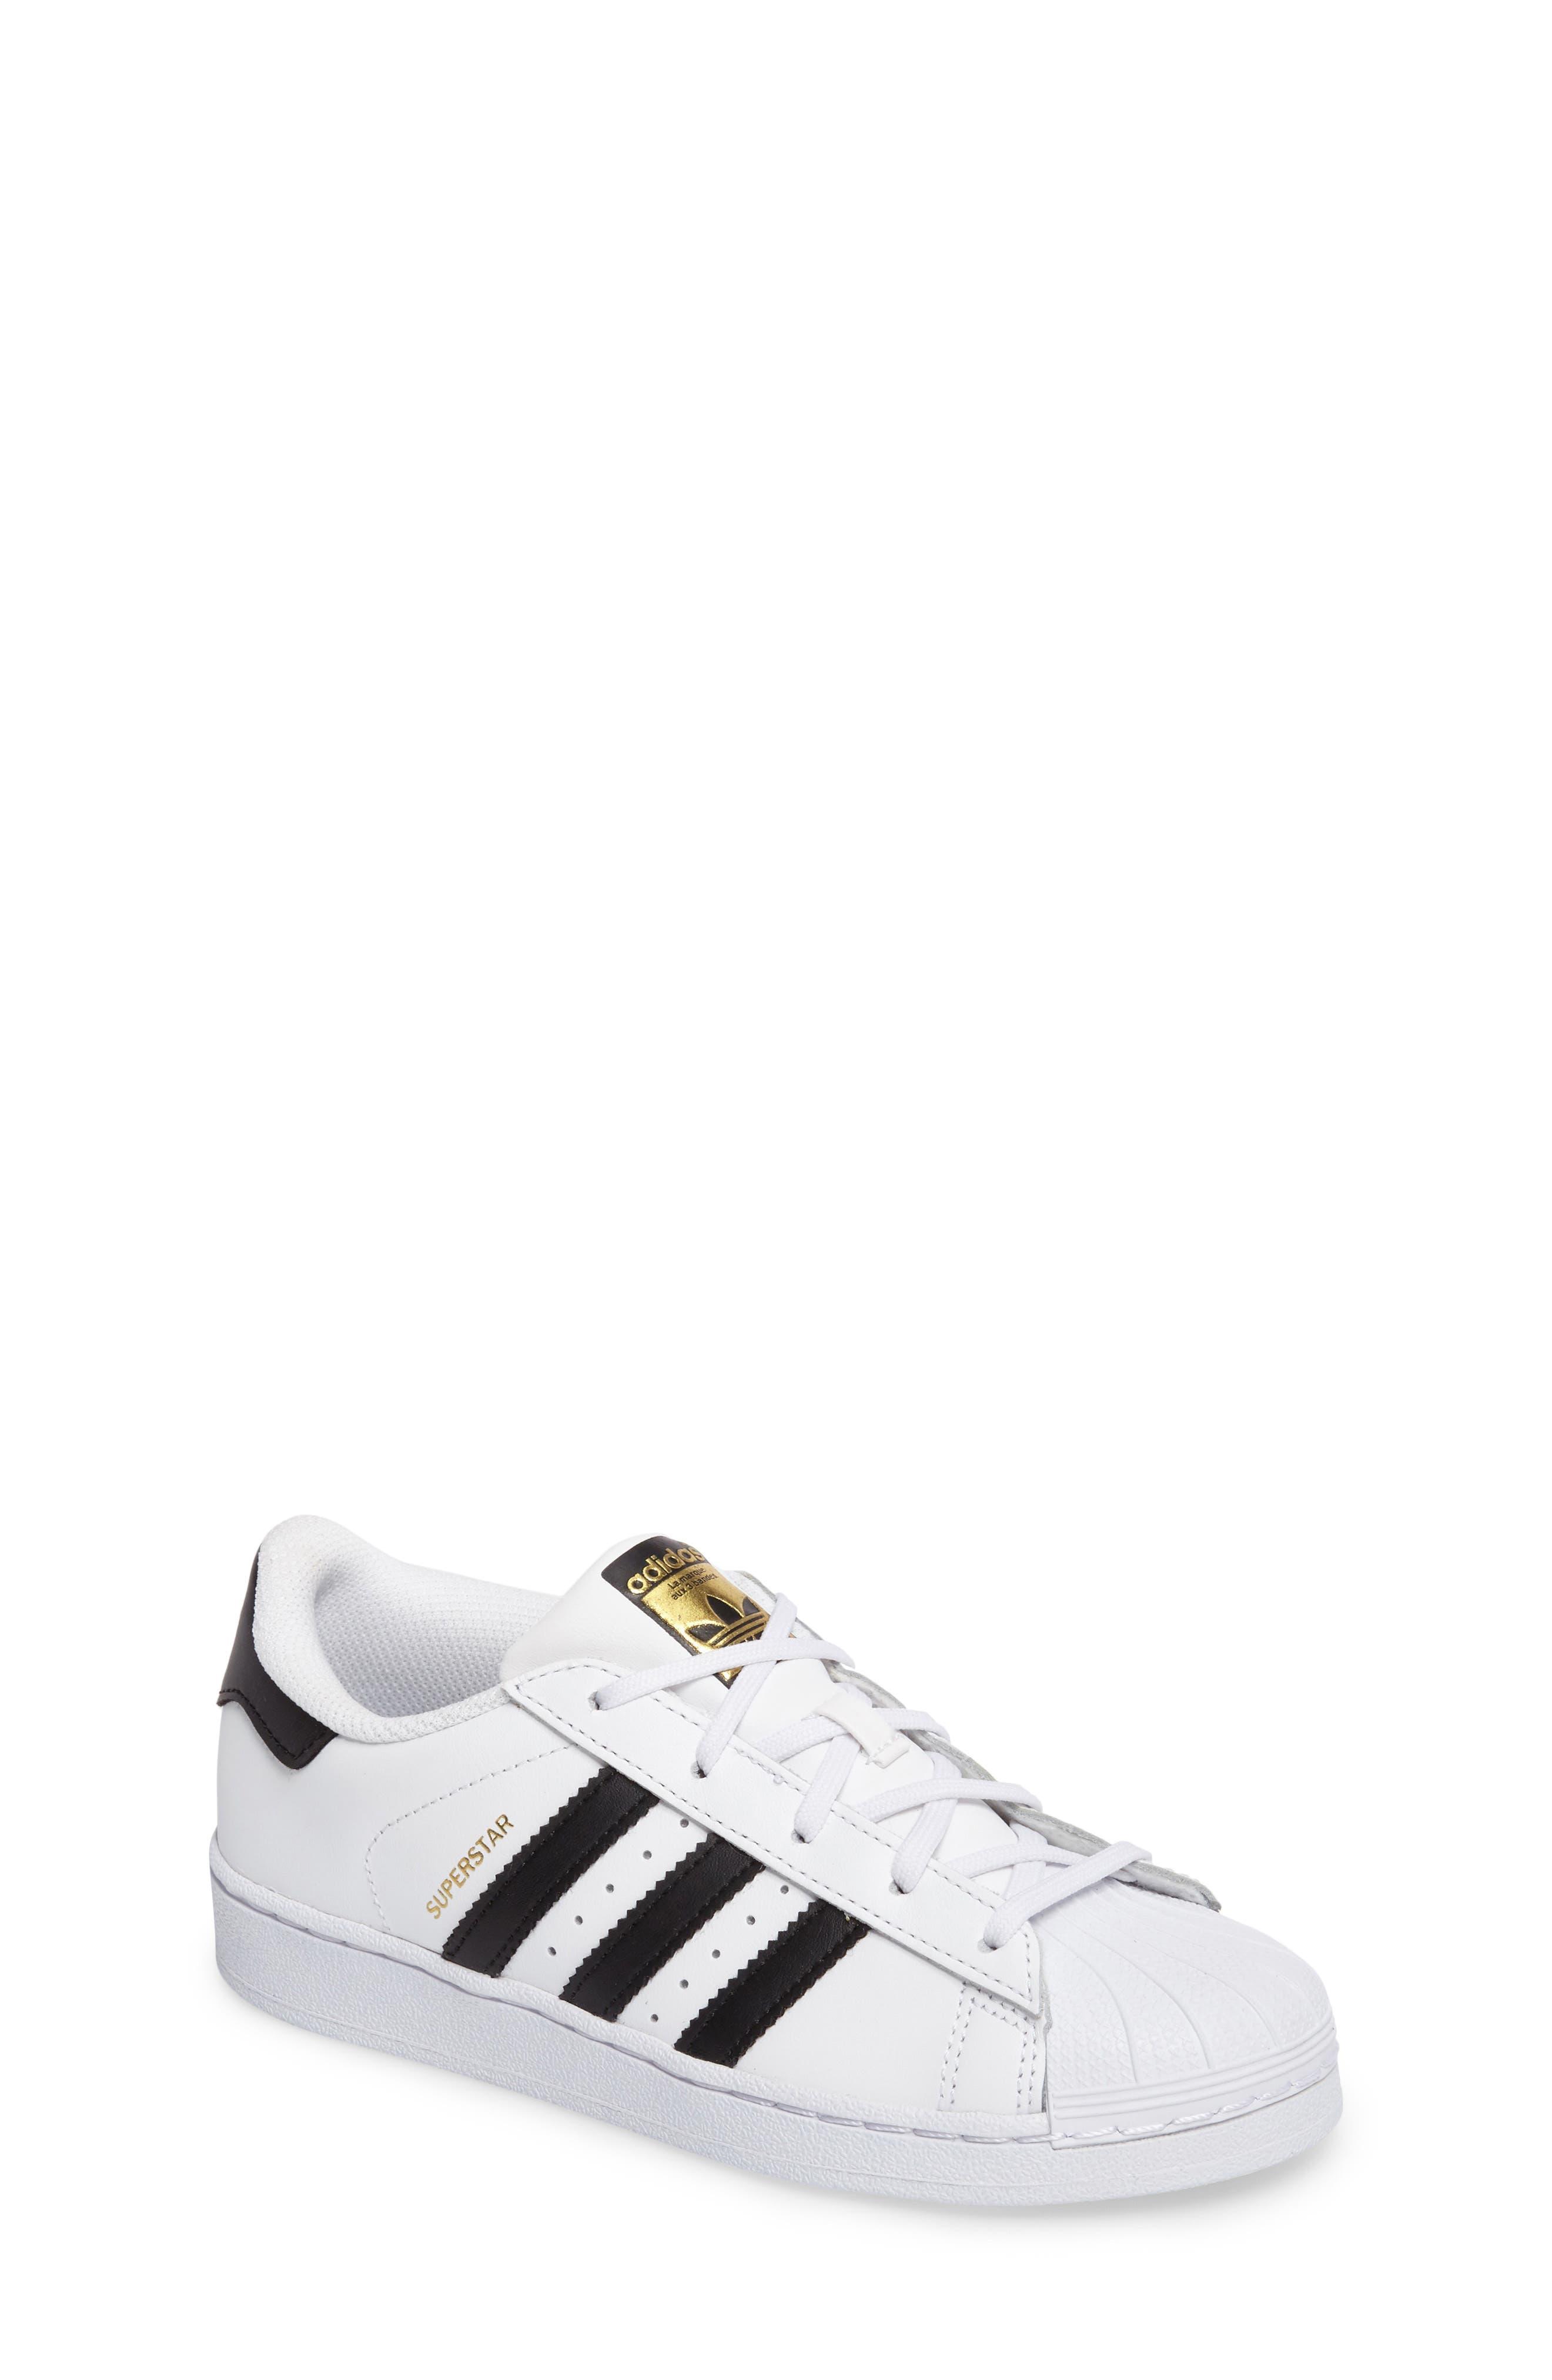 ADIDAS 'Superstar Foundation' Sneaker, Main, color, WHITE/ BLACK